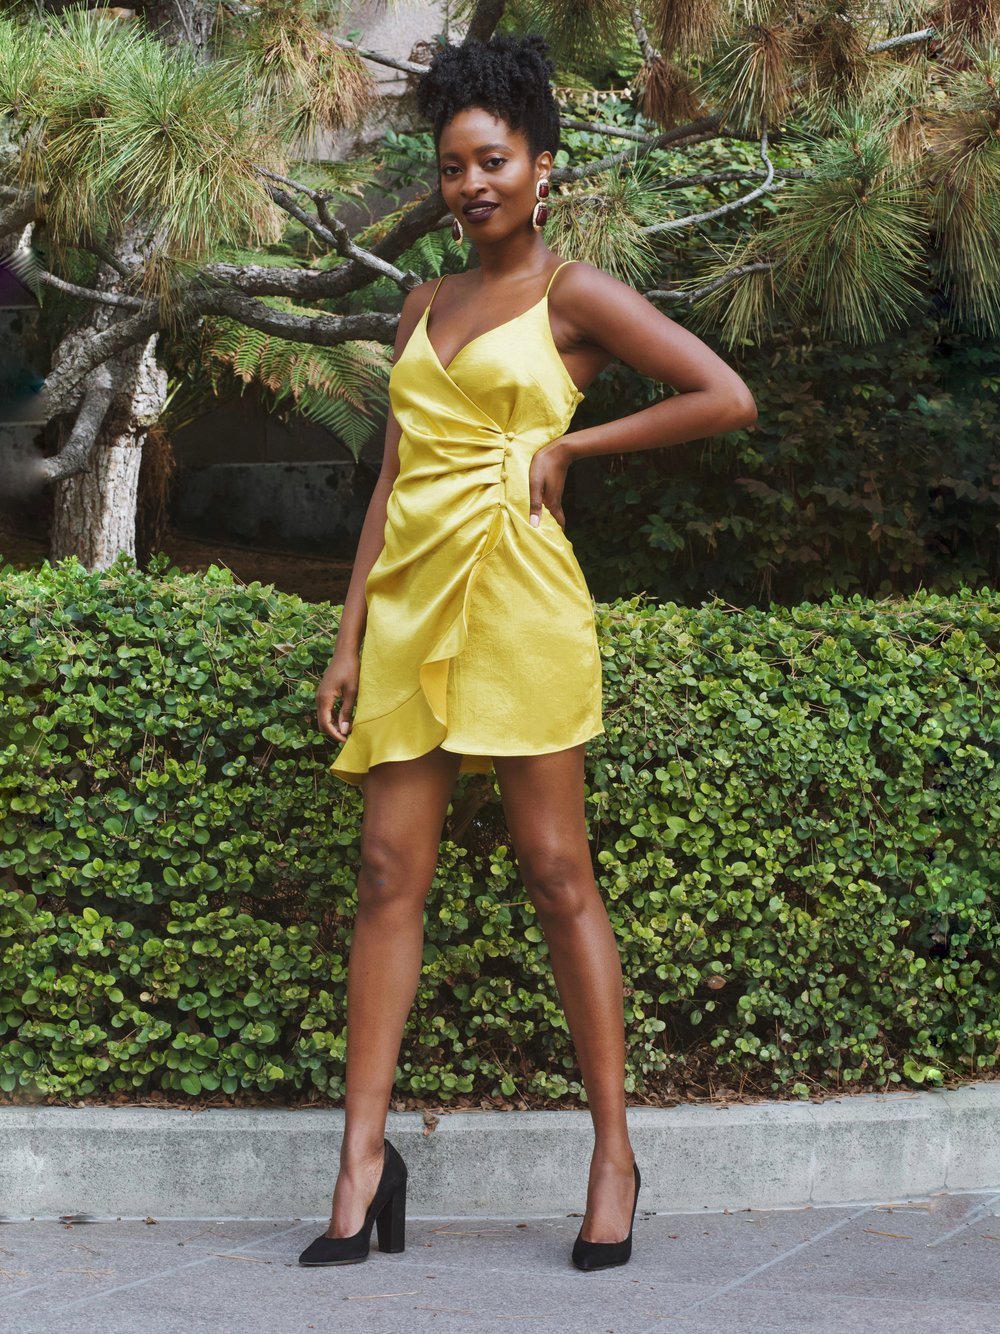 DreSs x Topshop - Click to shop this dress!